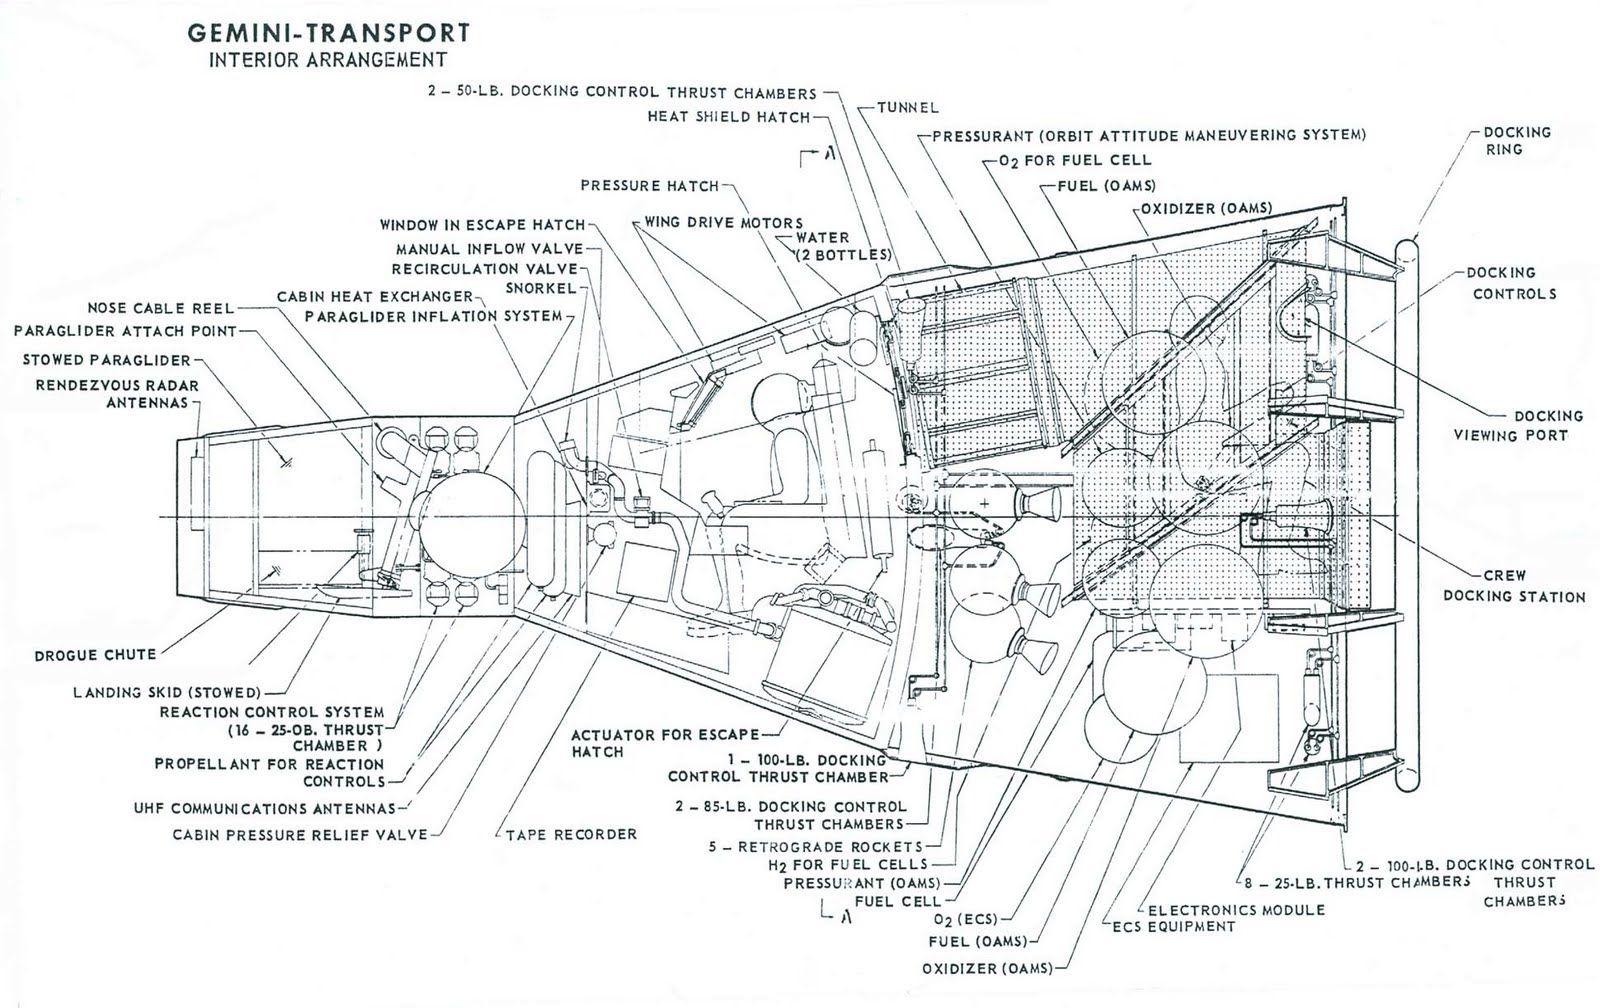 Esa Spaceship Design Page 4 Pics About Space Inspiration Galileo Probe Diagram